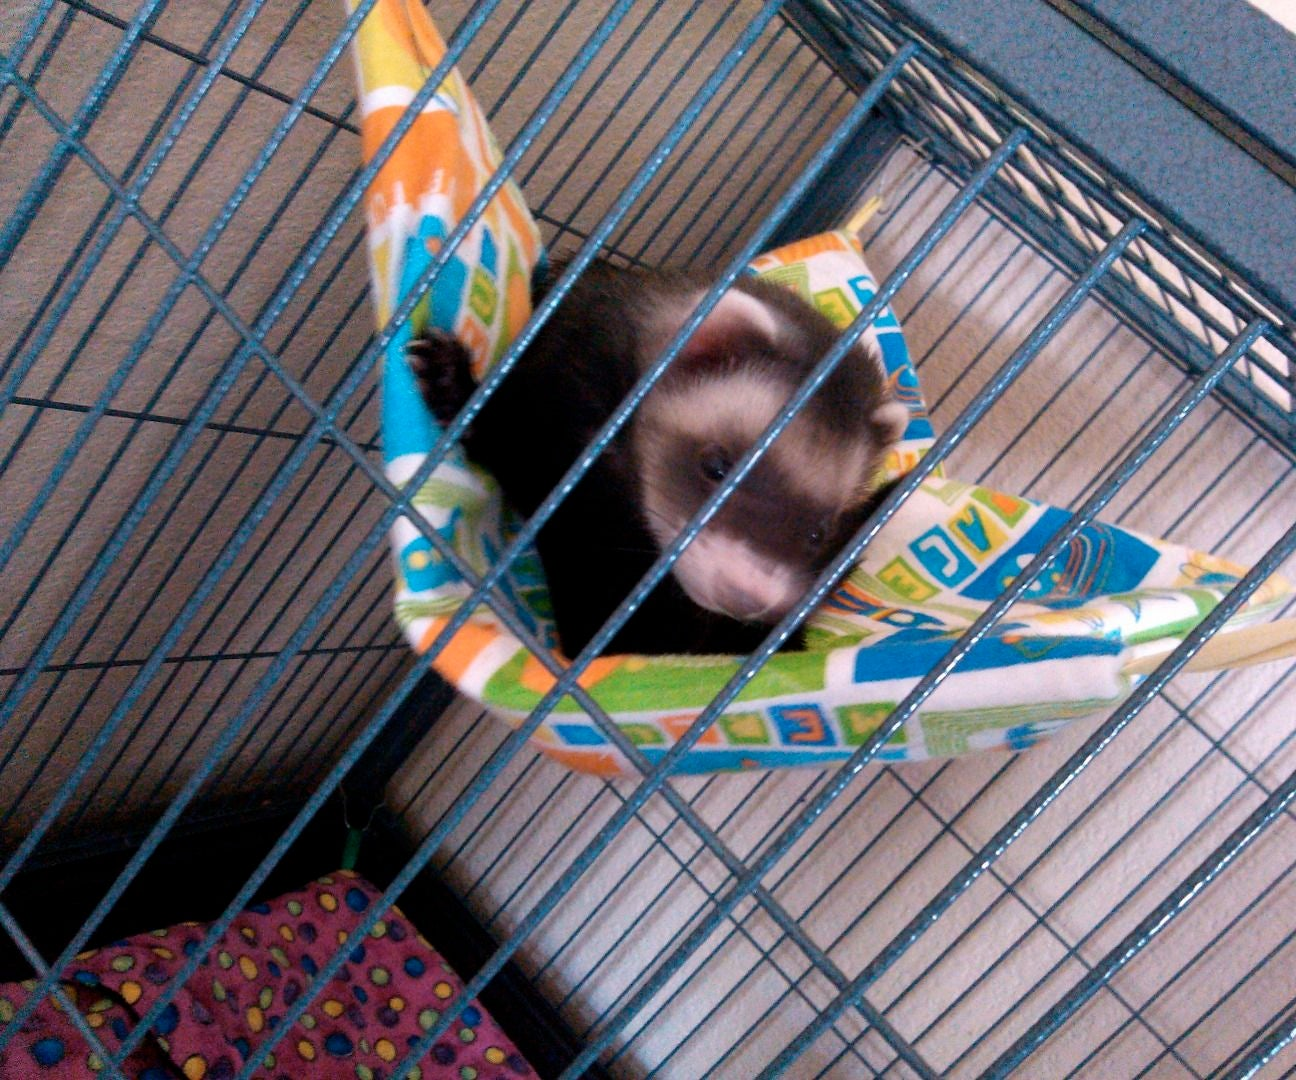 It's Hammock Time! (Ferret Sleepsack)